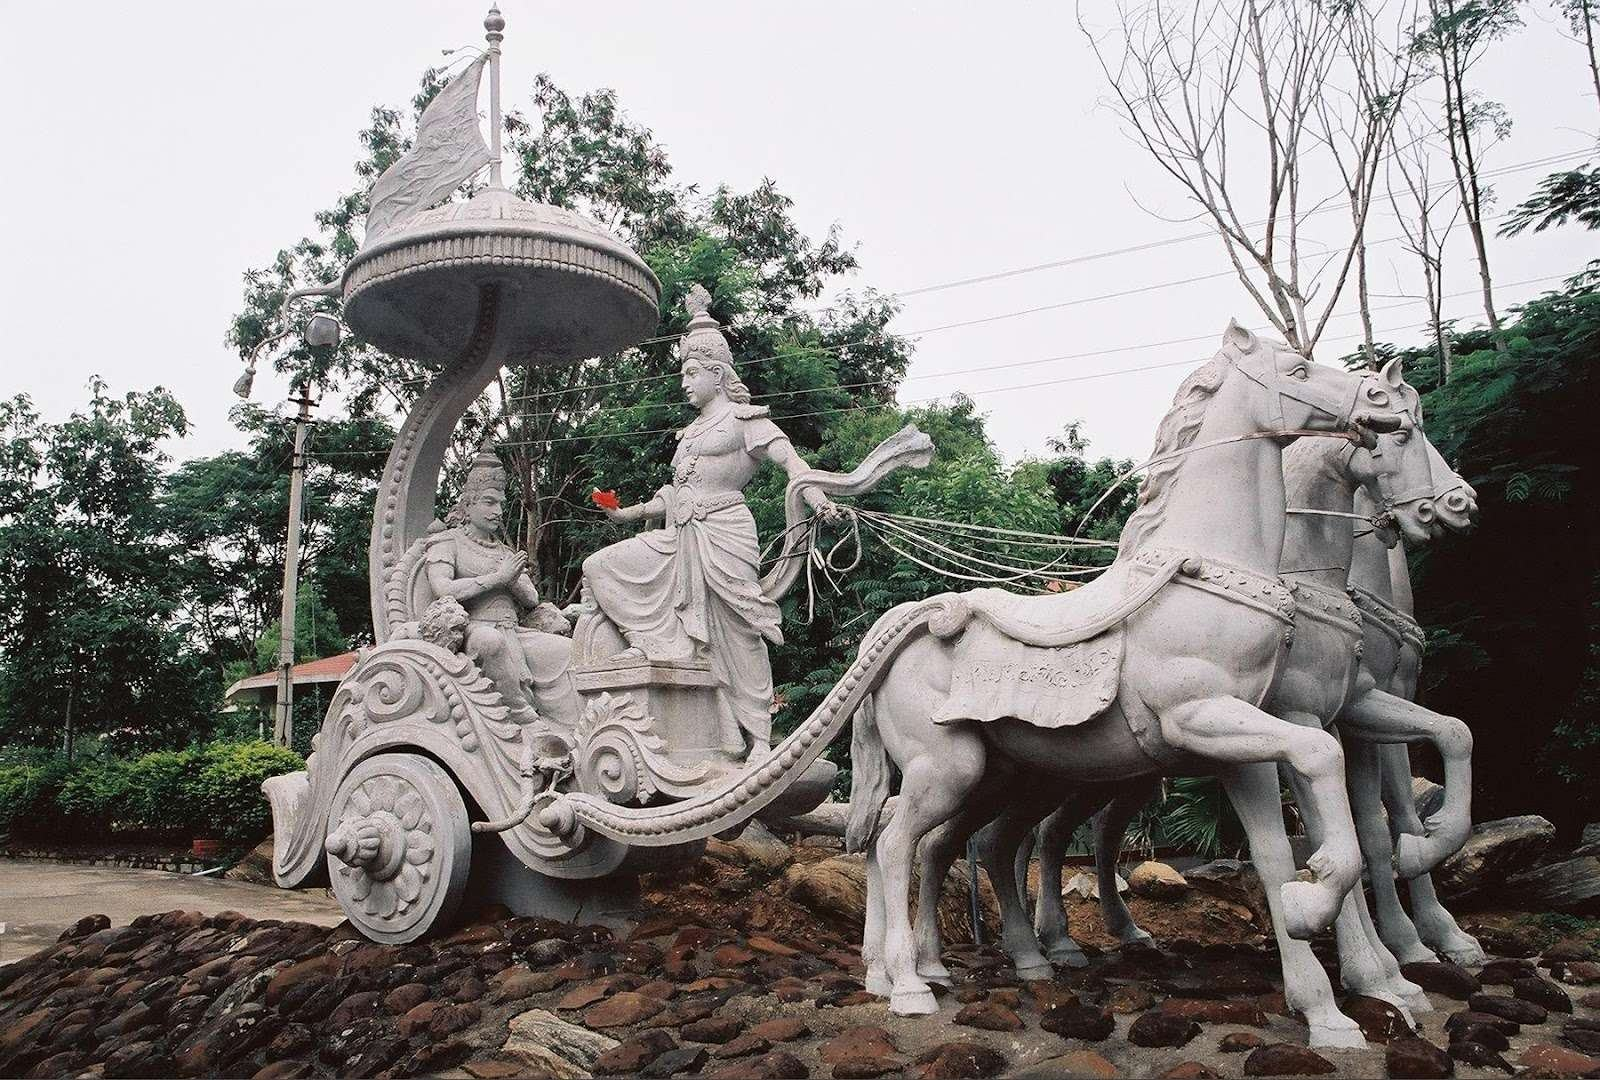 Bhagavad Gita Wallpaper Gallery bhagavad gita 1600x1080